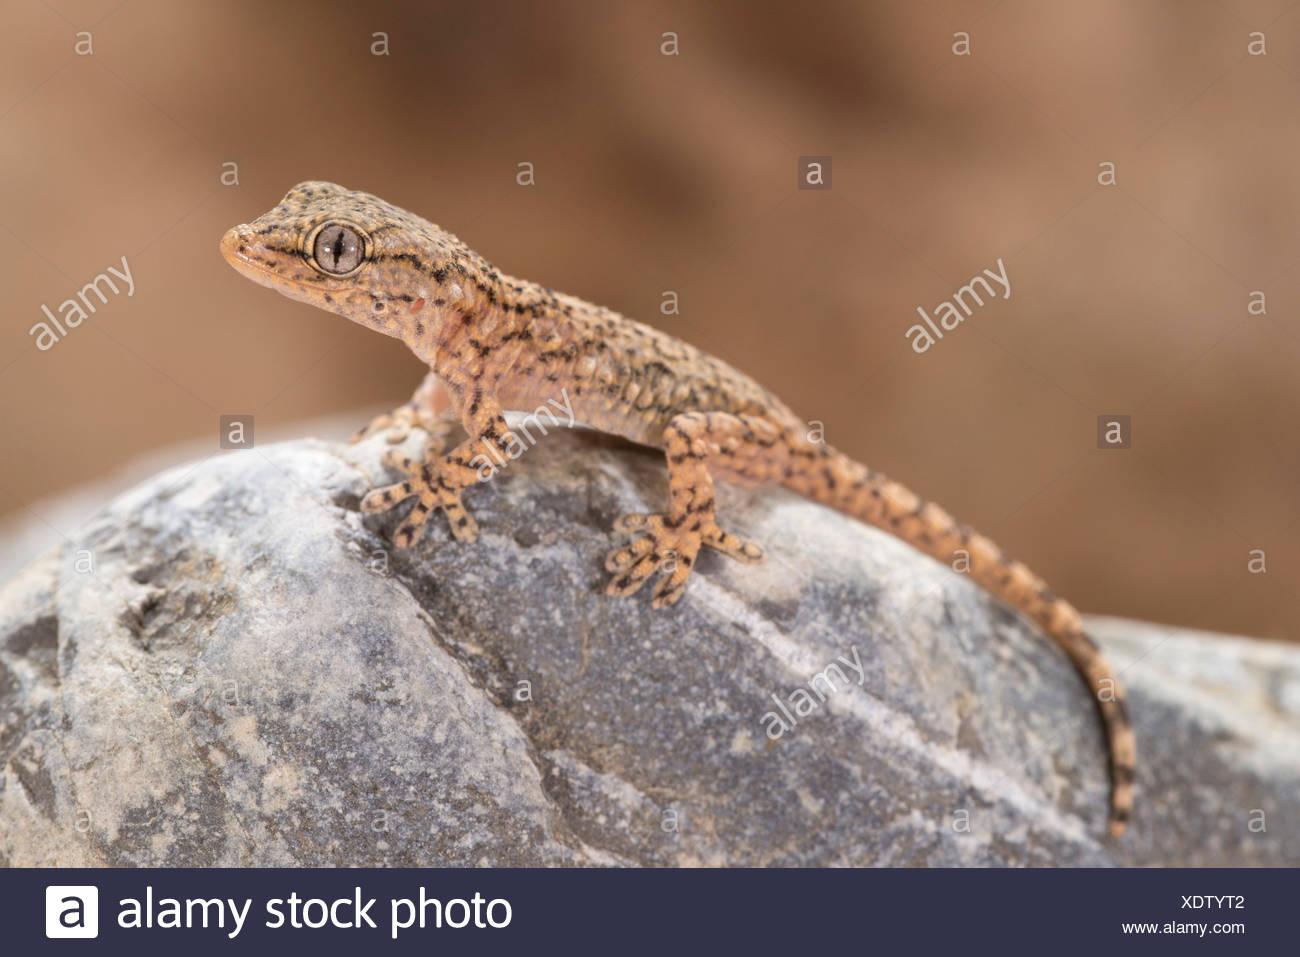 Spécimen juvénile de gecko commun appartenant à l'espèce Tarentula mauritanica Photo Stock